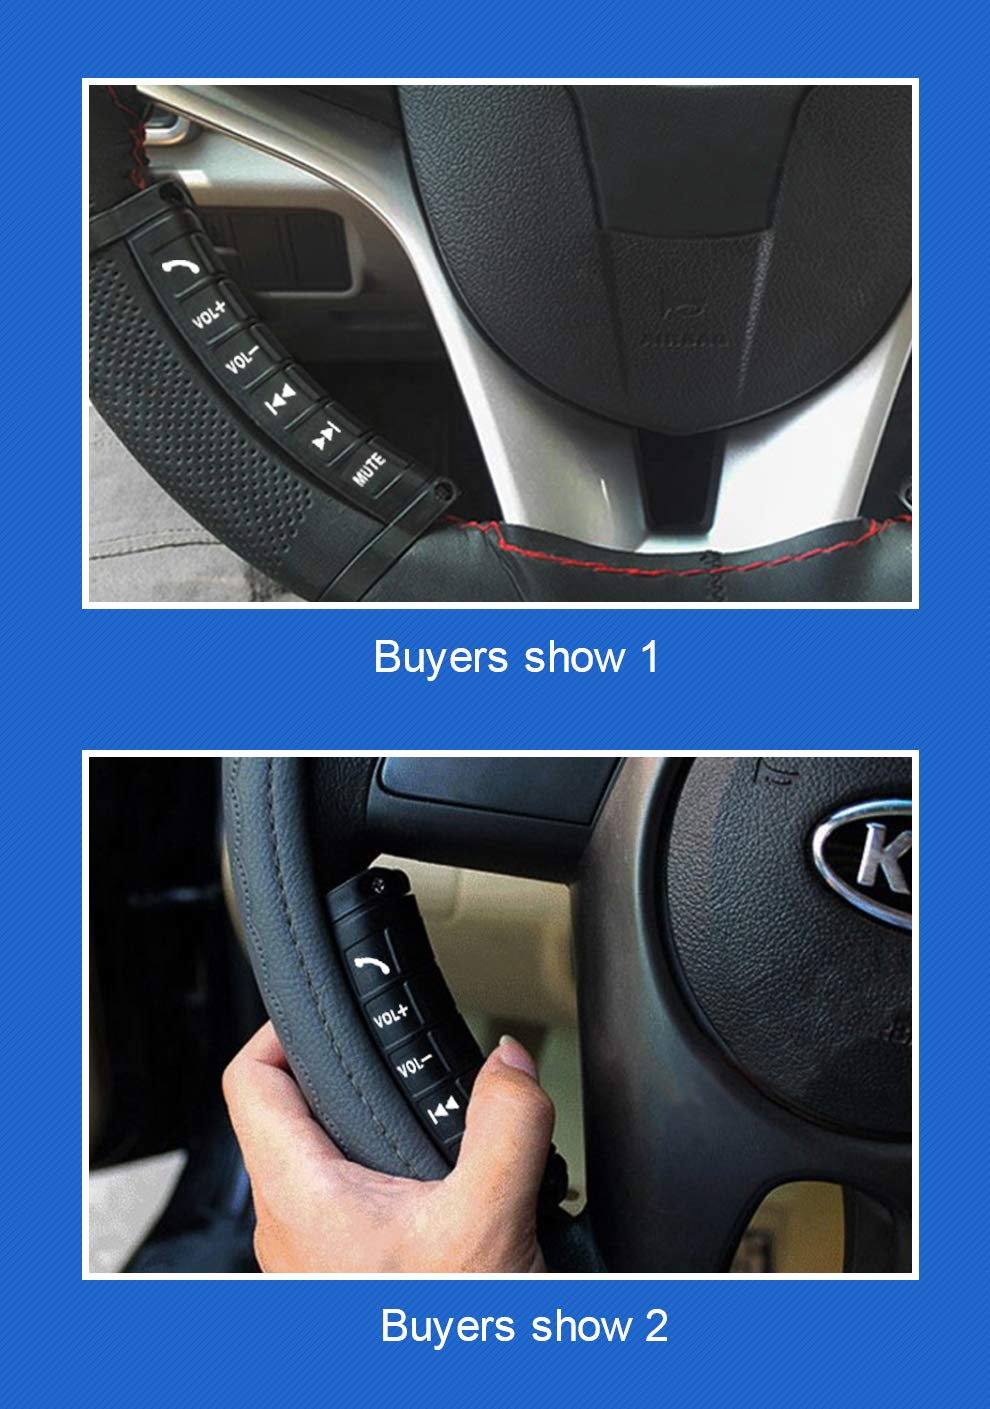 Doppel-Din-Autoradio-Fernbedienung-fr-MiCarBa-kompatibel-mit-den-meisten-Autoradios-MP5-CL7032353638